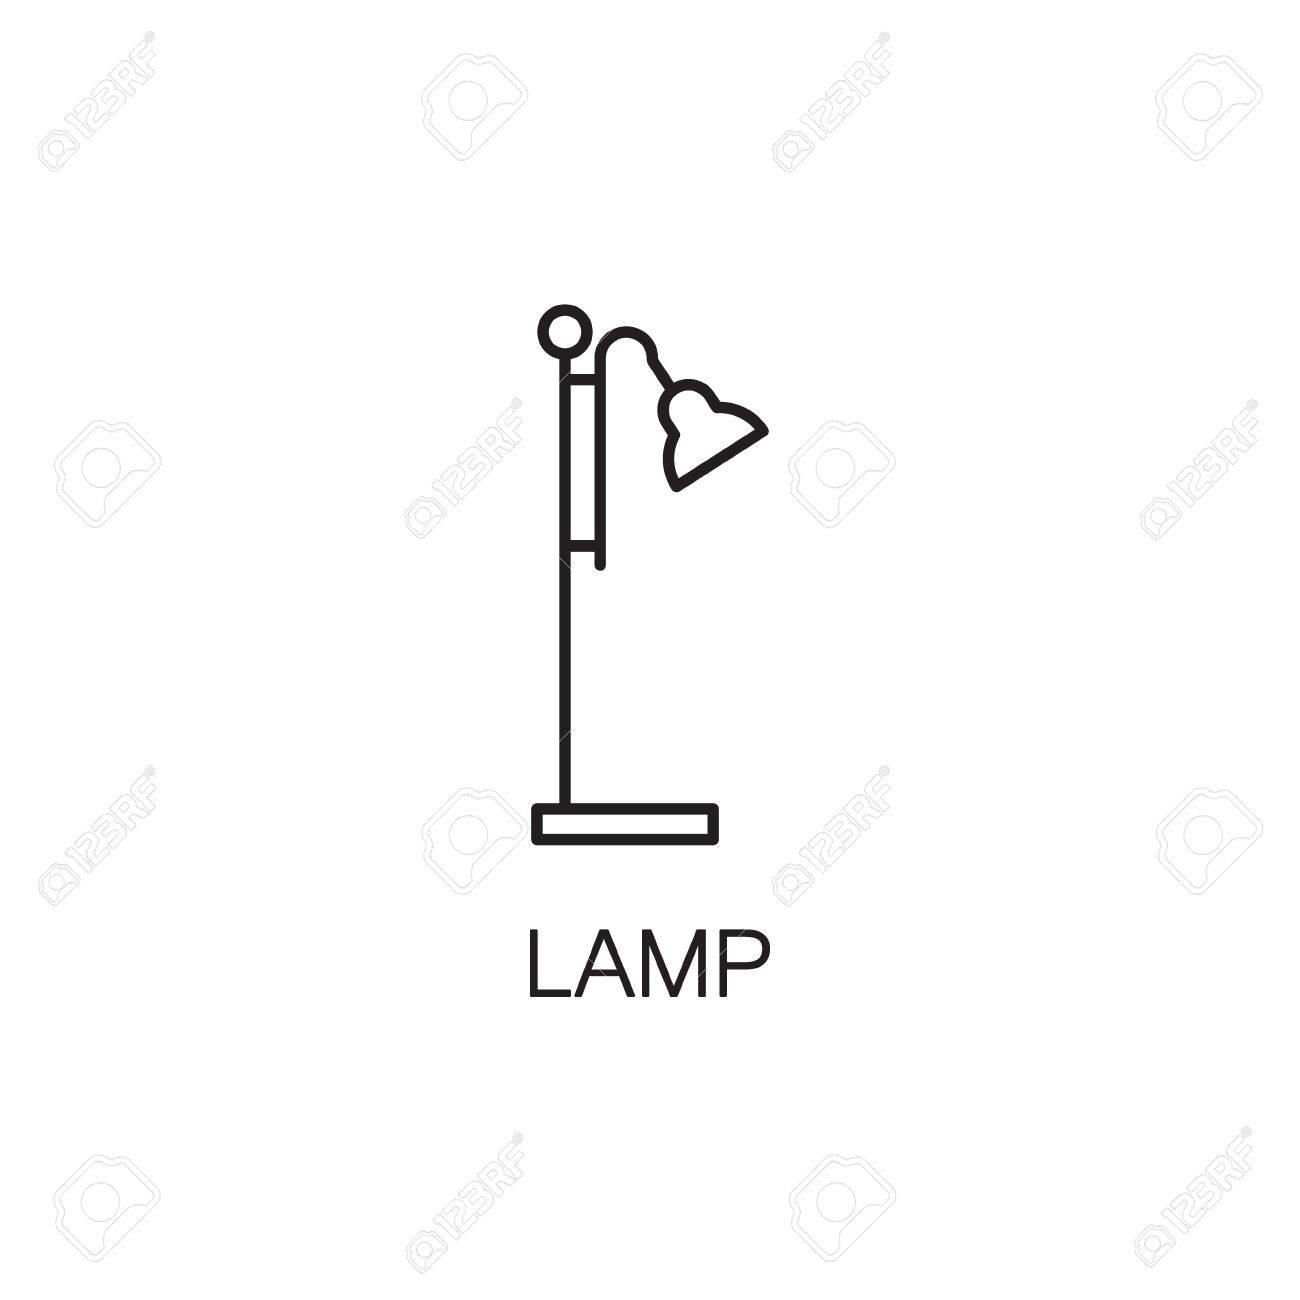 Groß Spulenkreis Symbol Fotos - Elektrische Schaltplan-Ideen ...